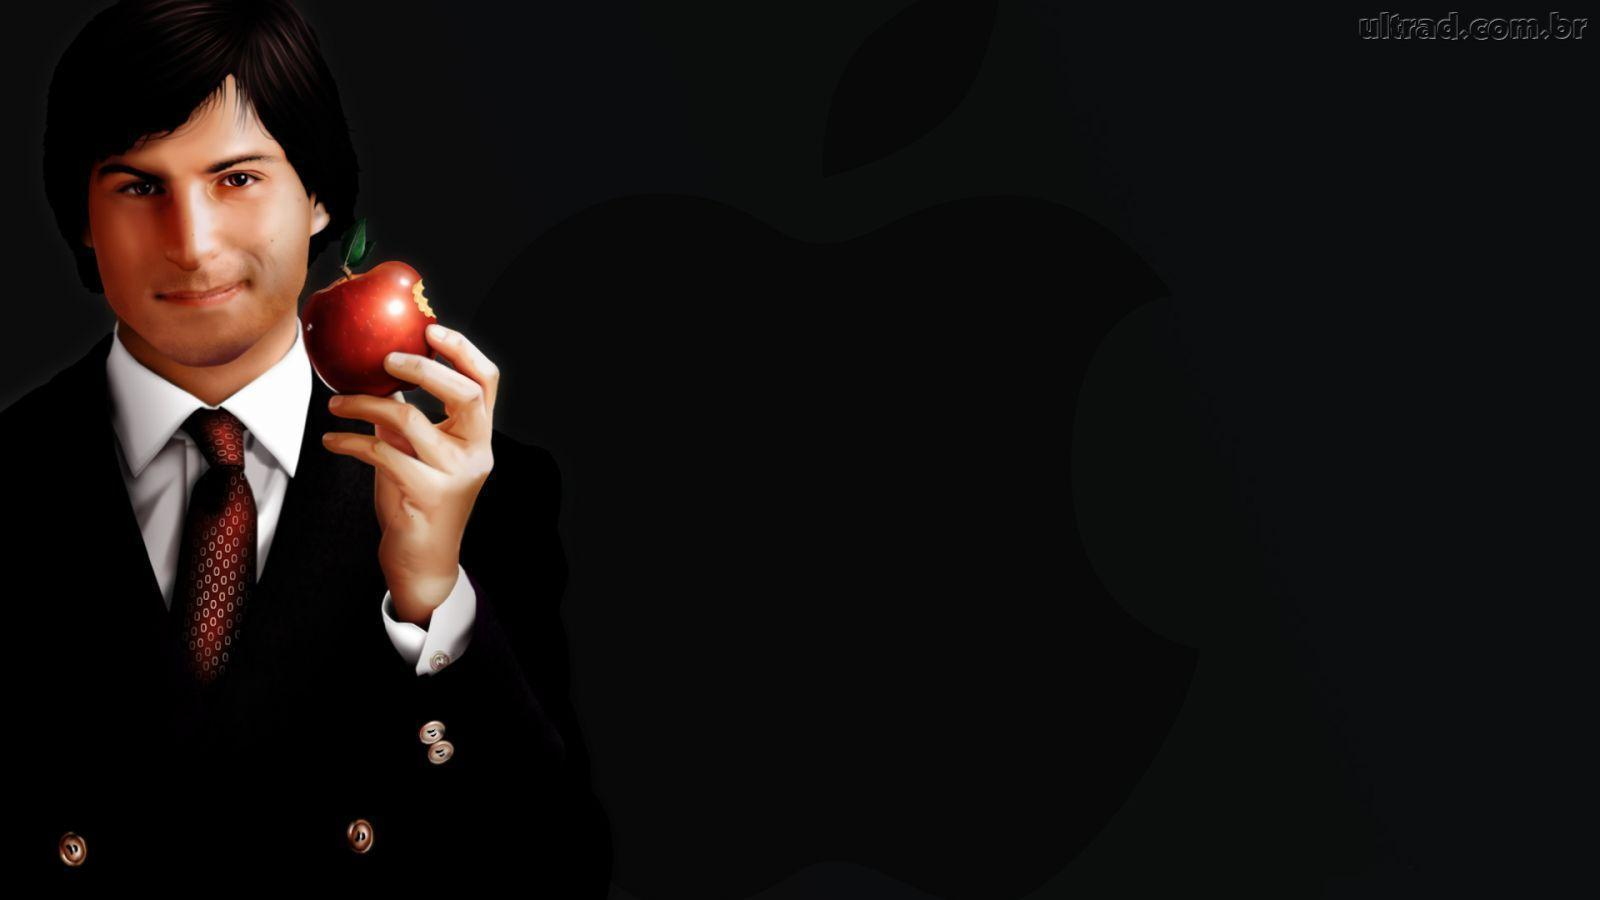 Steve Jobs Wallpaper Cute Apple Hd Wallpapers